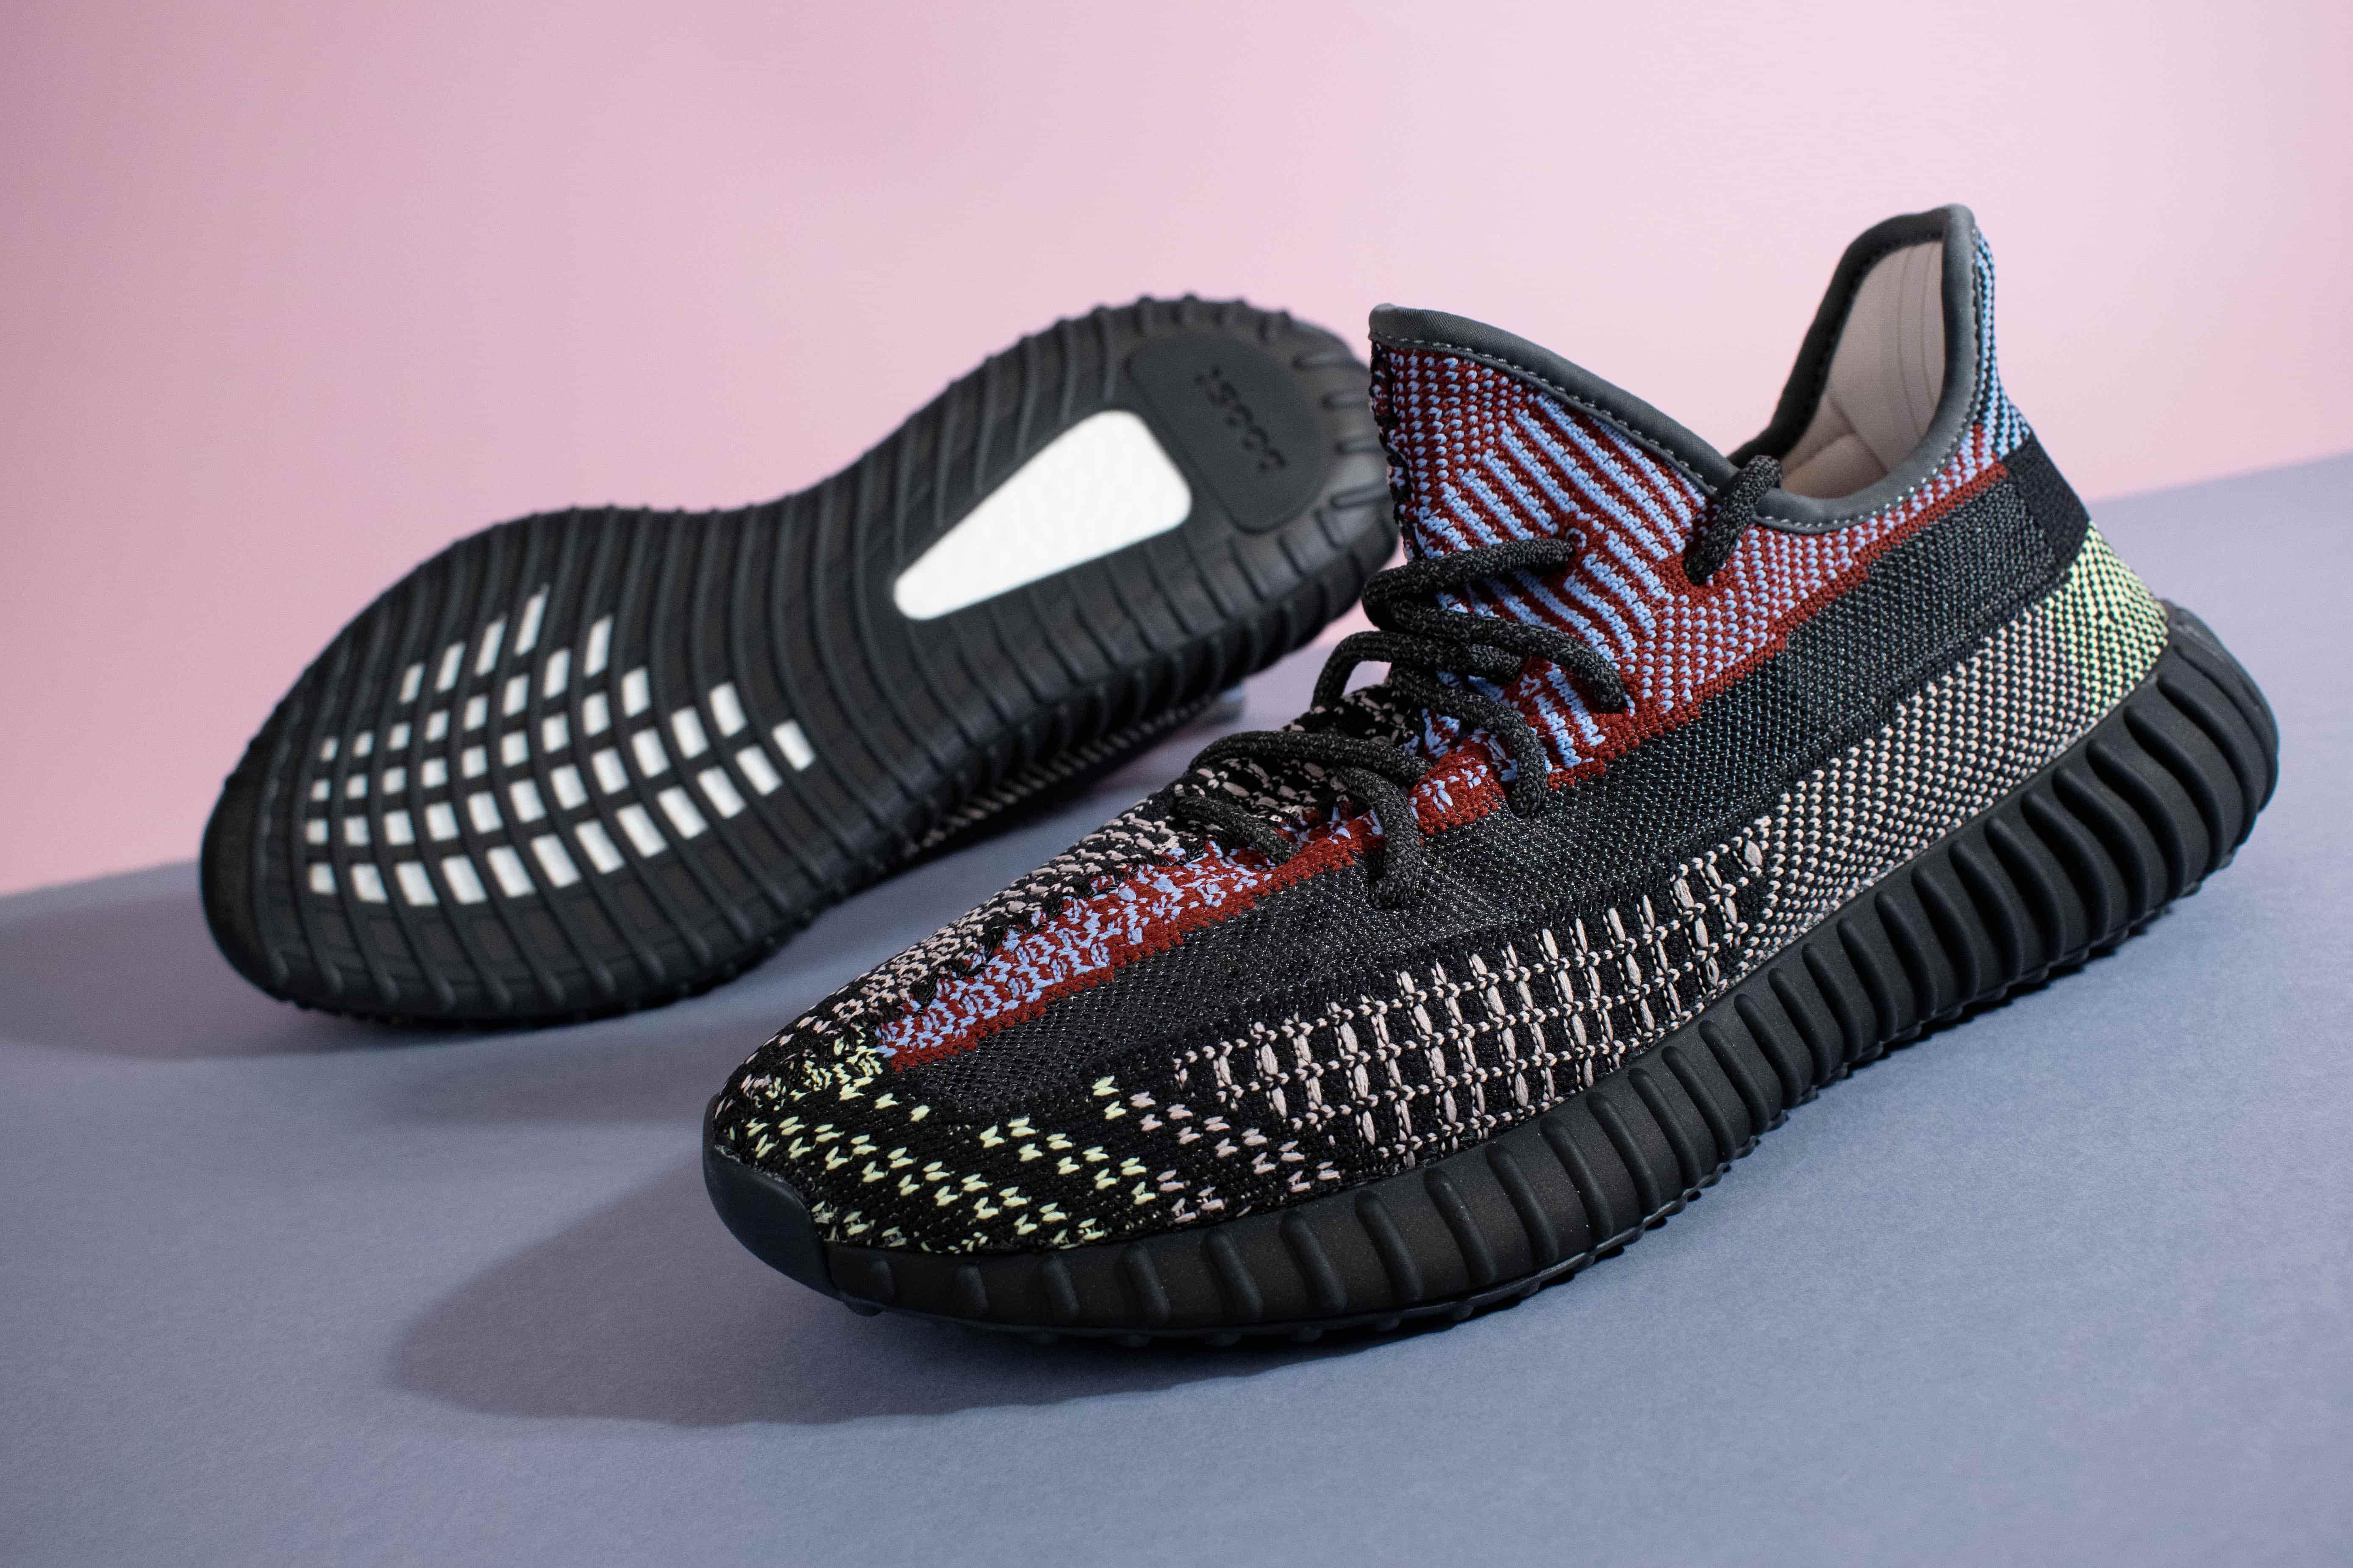 Adidas | Brand | Edizione Limitata | Hype Clothinga